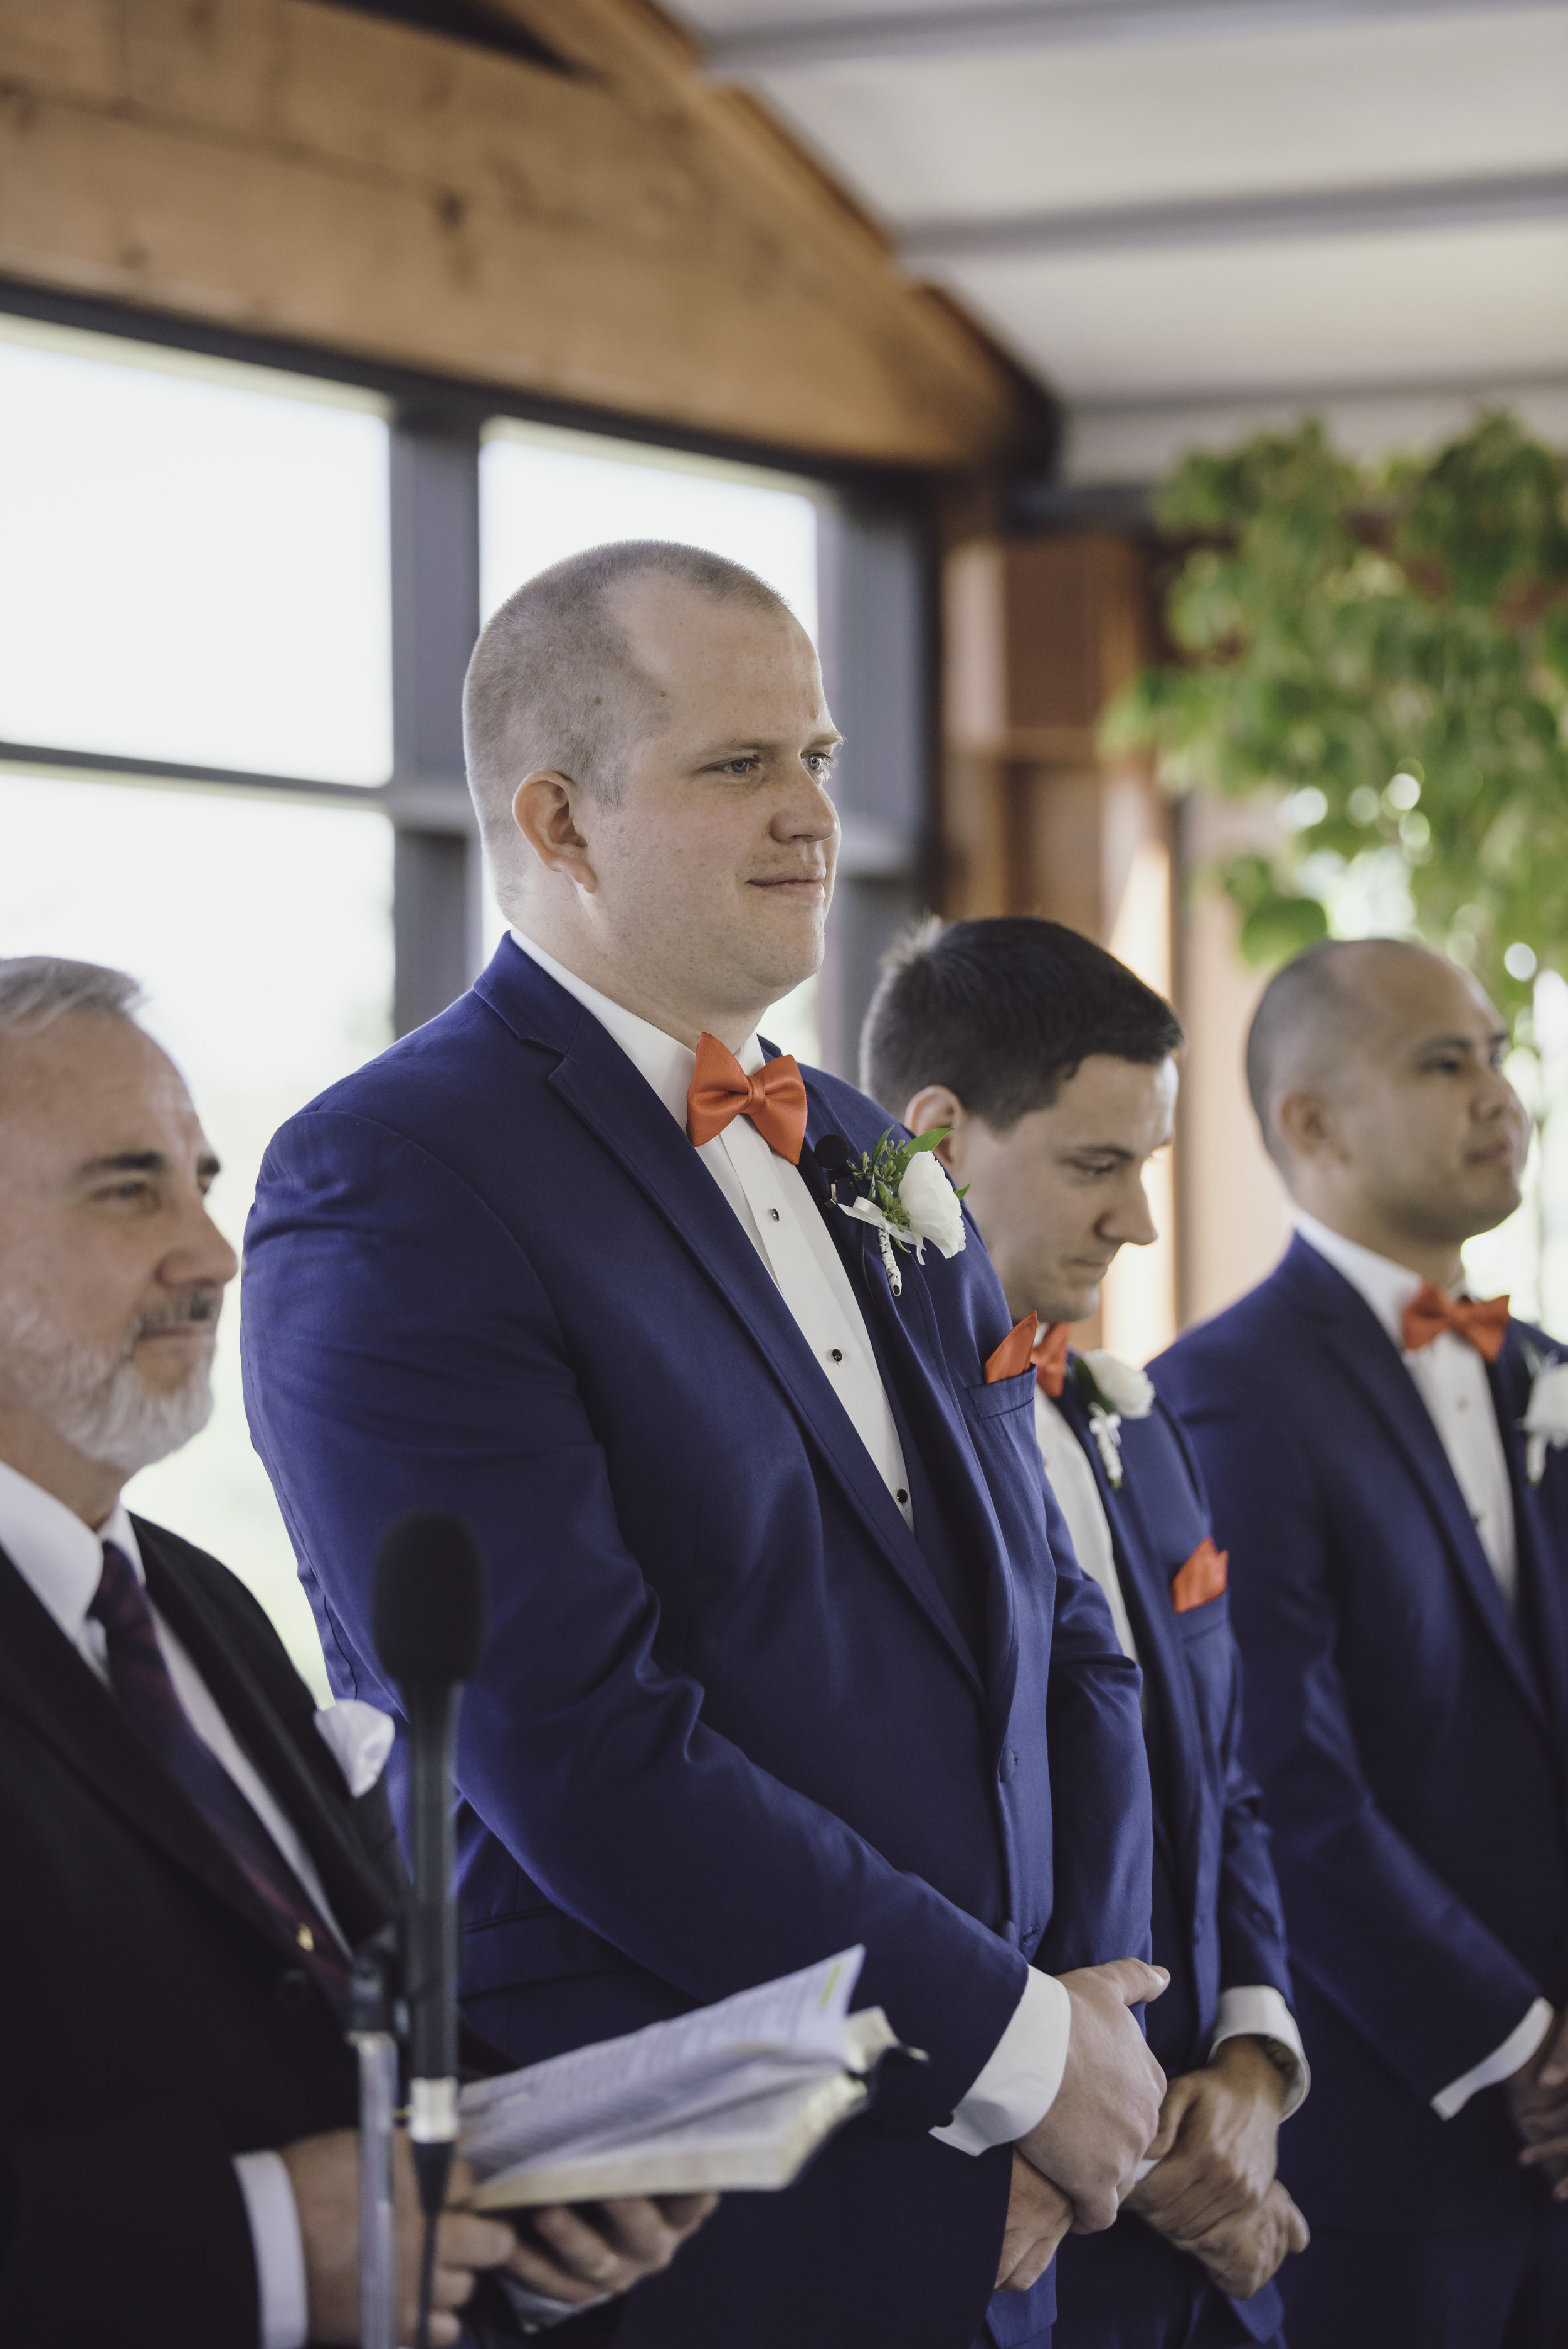 Will&Steph wedding -337.jpg